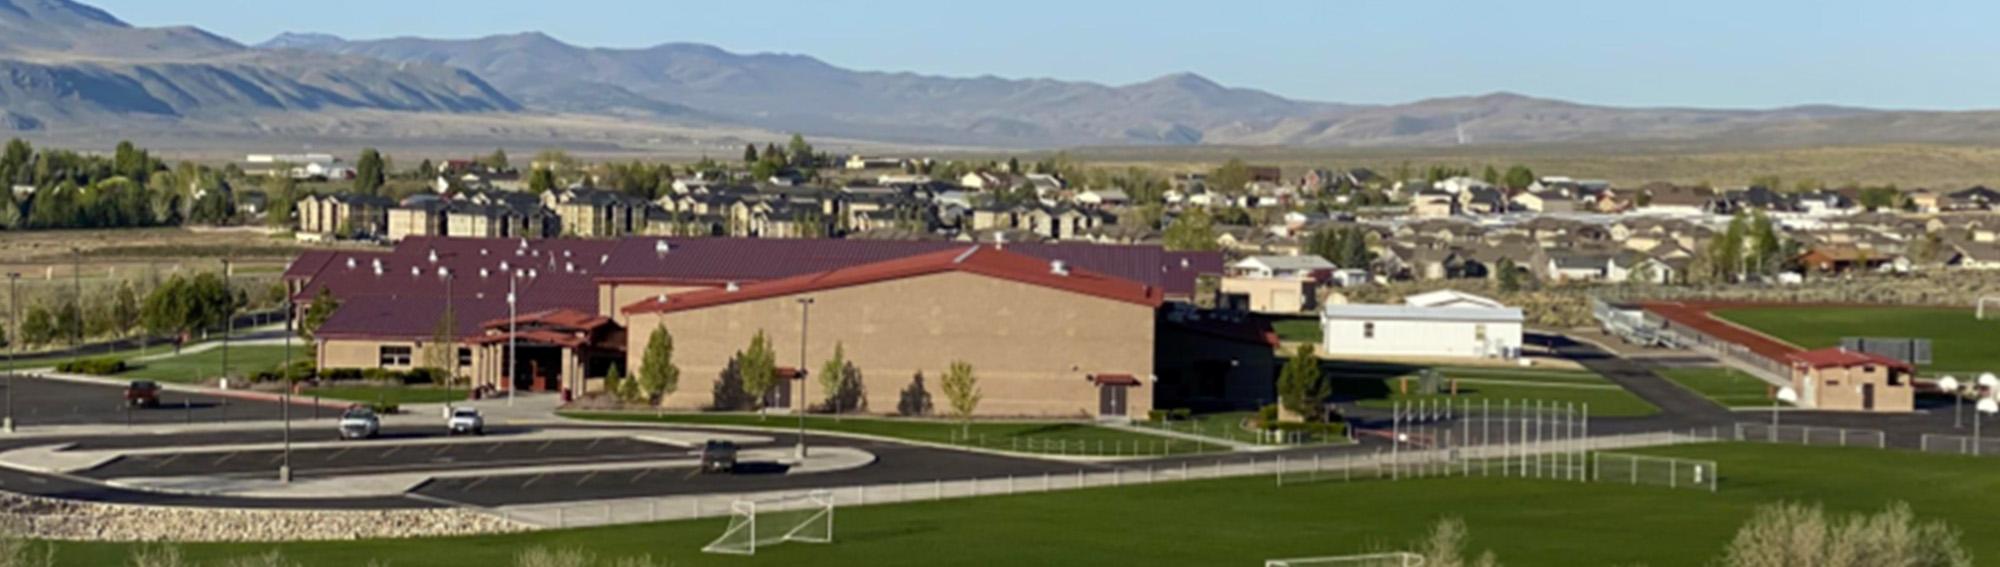 Adobe Middle School campus aerial photo